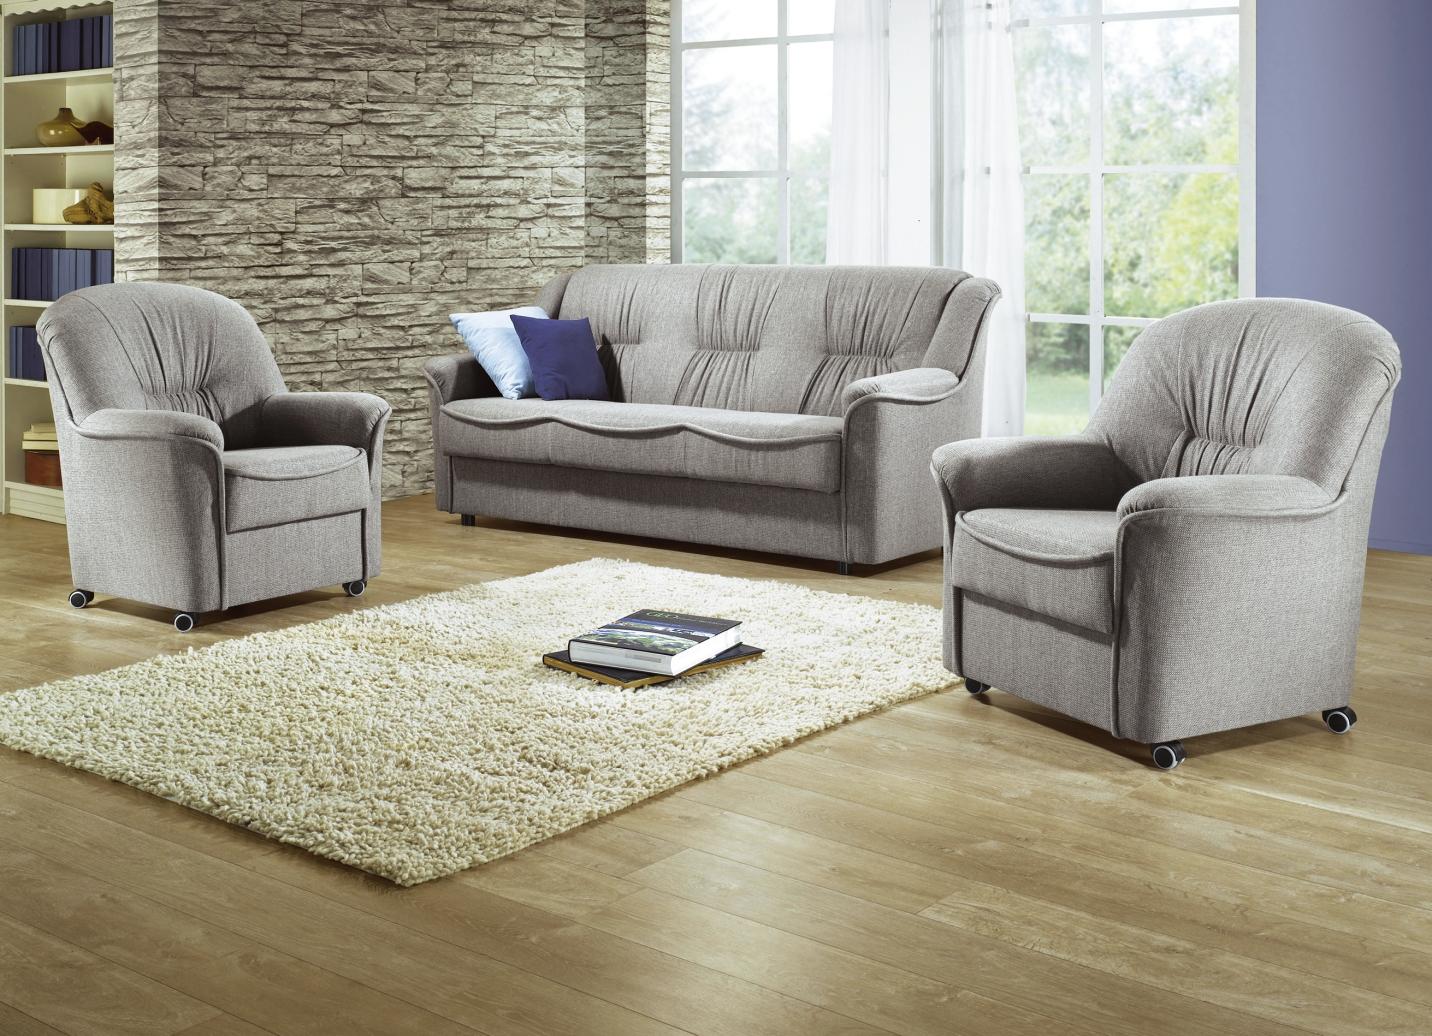 polstergruppe 3 teilig verschiedene farben klassische m bel bader. Black Bedroom Furniture Sets. Home Design Ideas